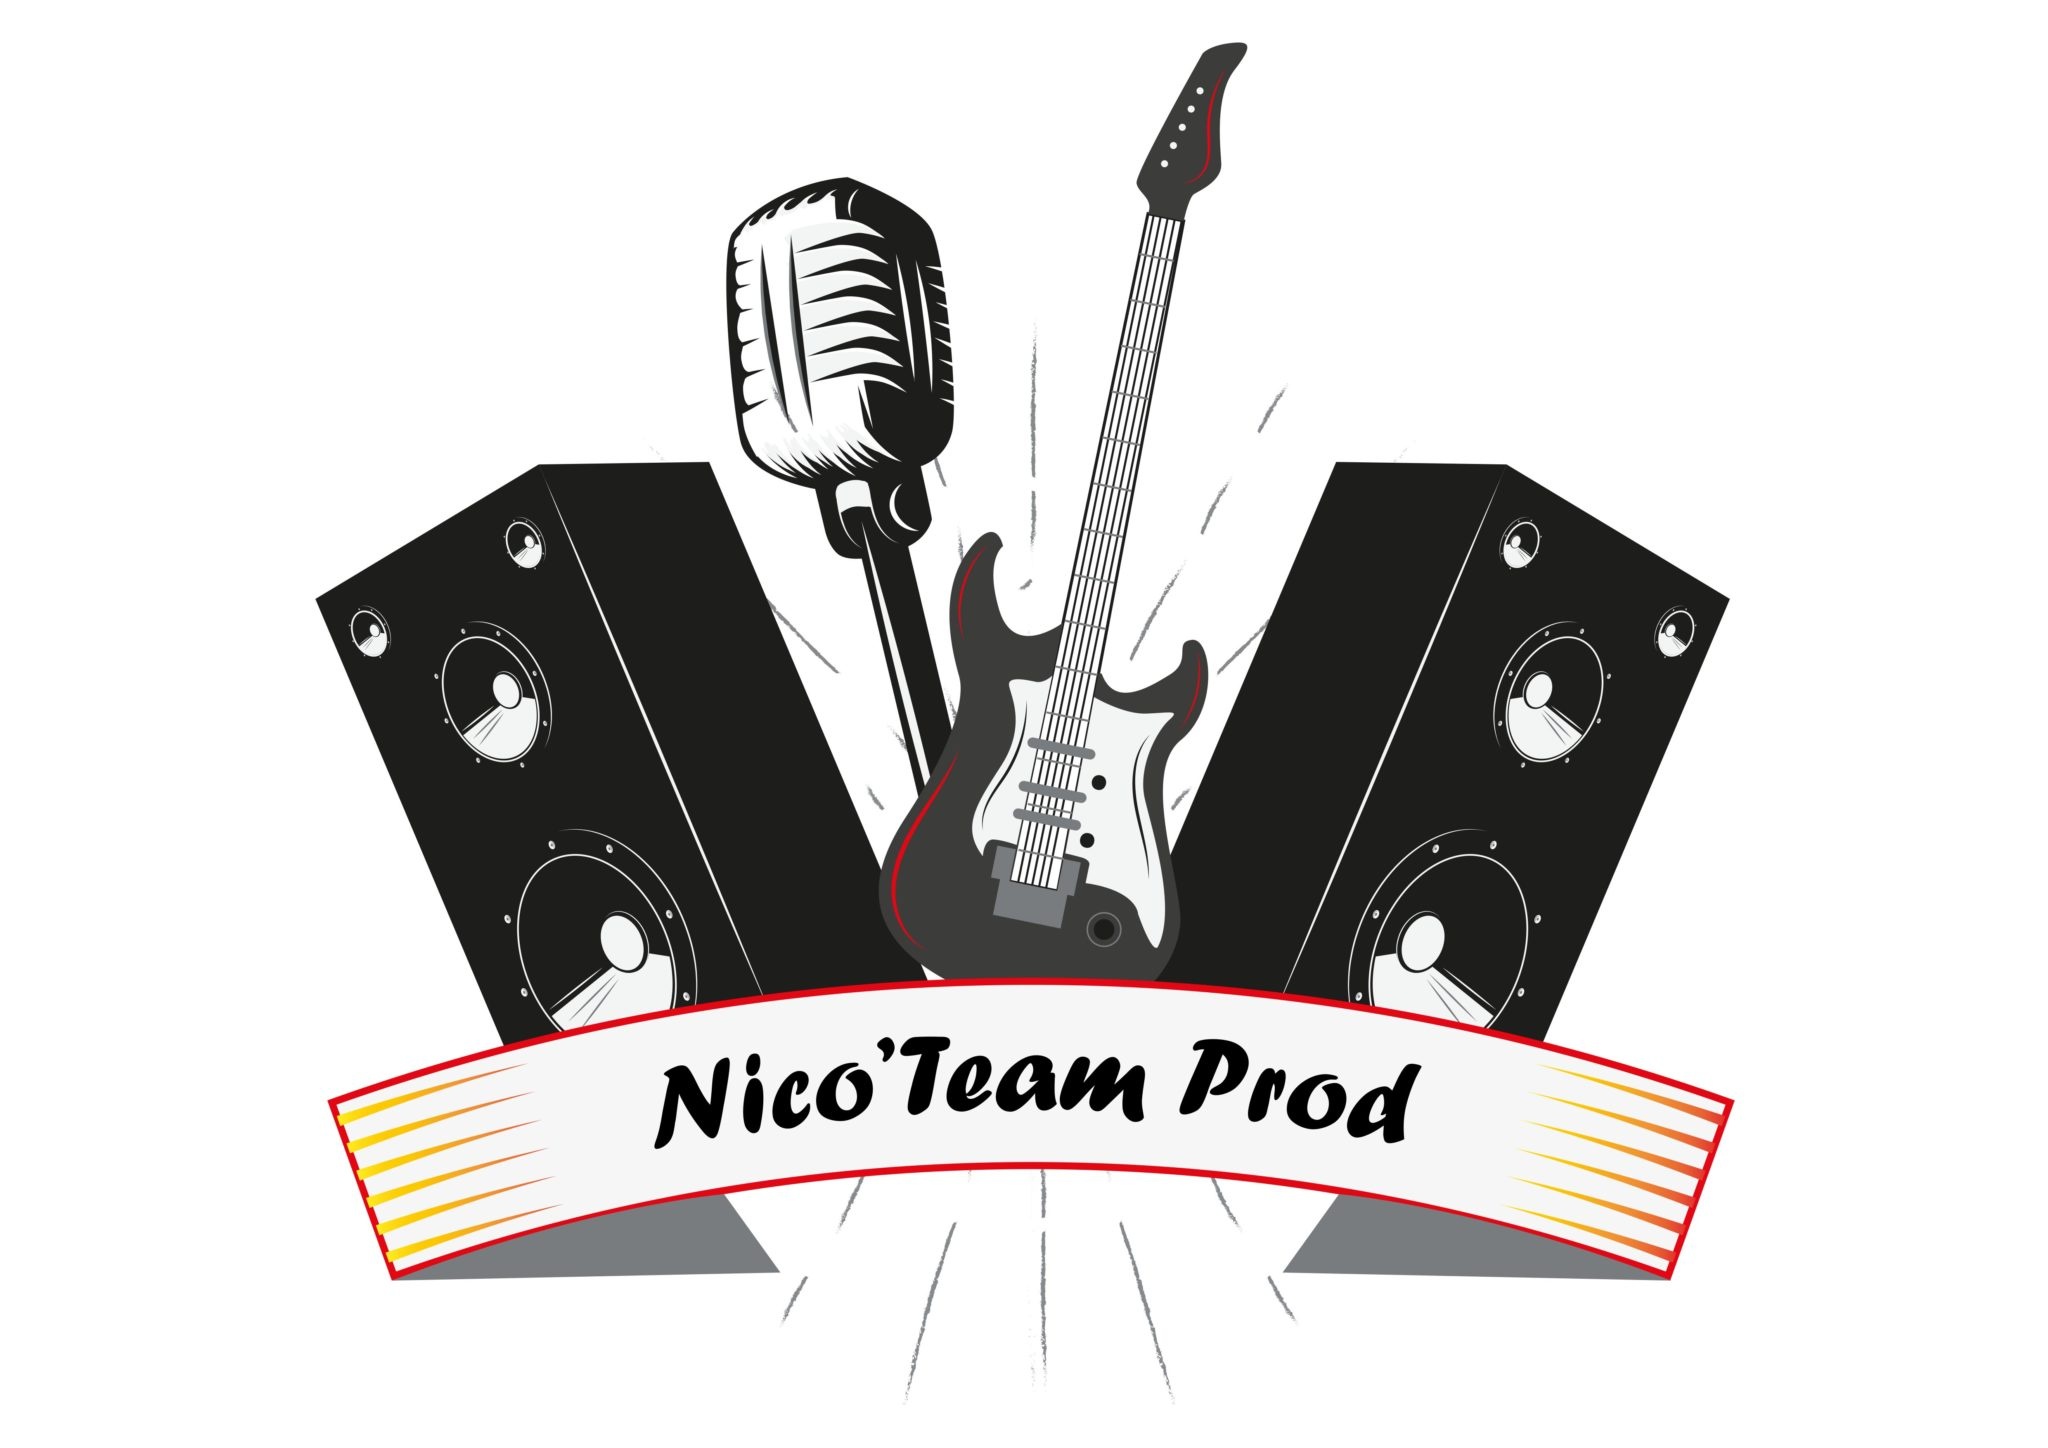 logoNico'Team Prod